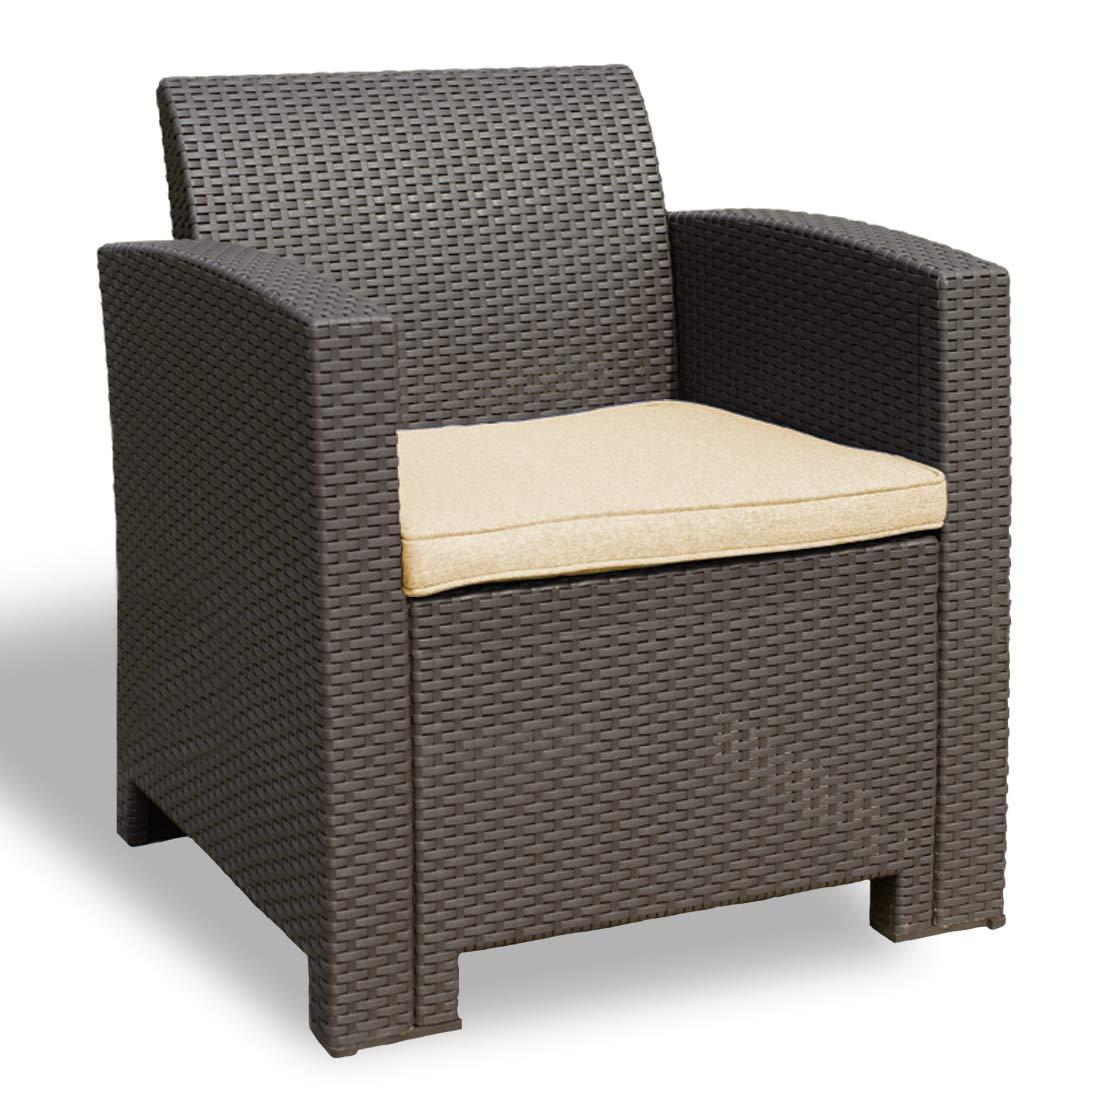 Free Adirondack Chair Patterns Browse Patterns